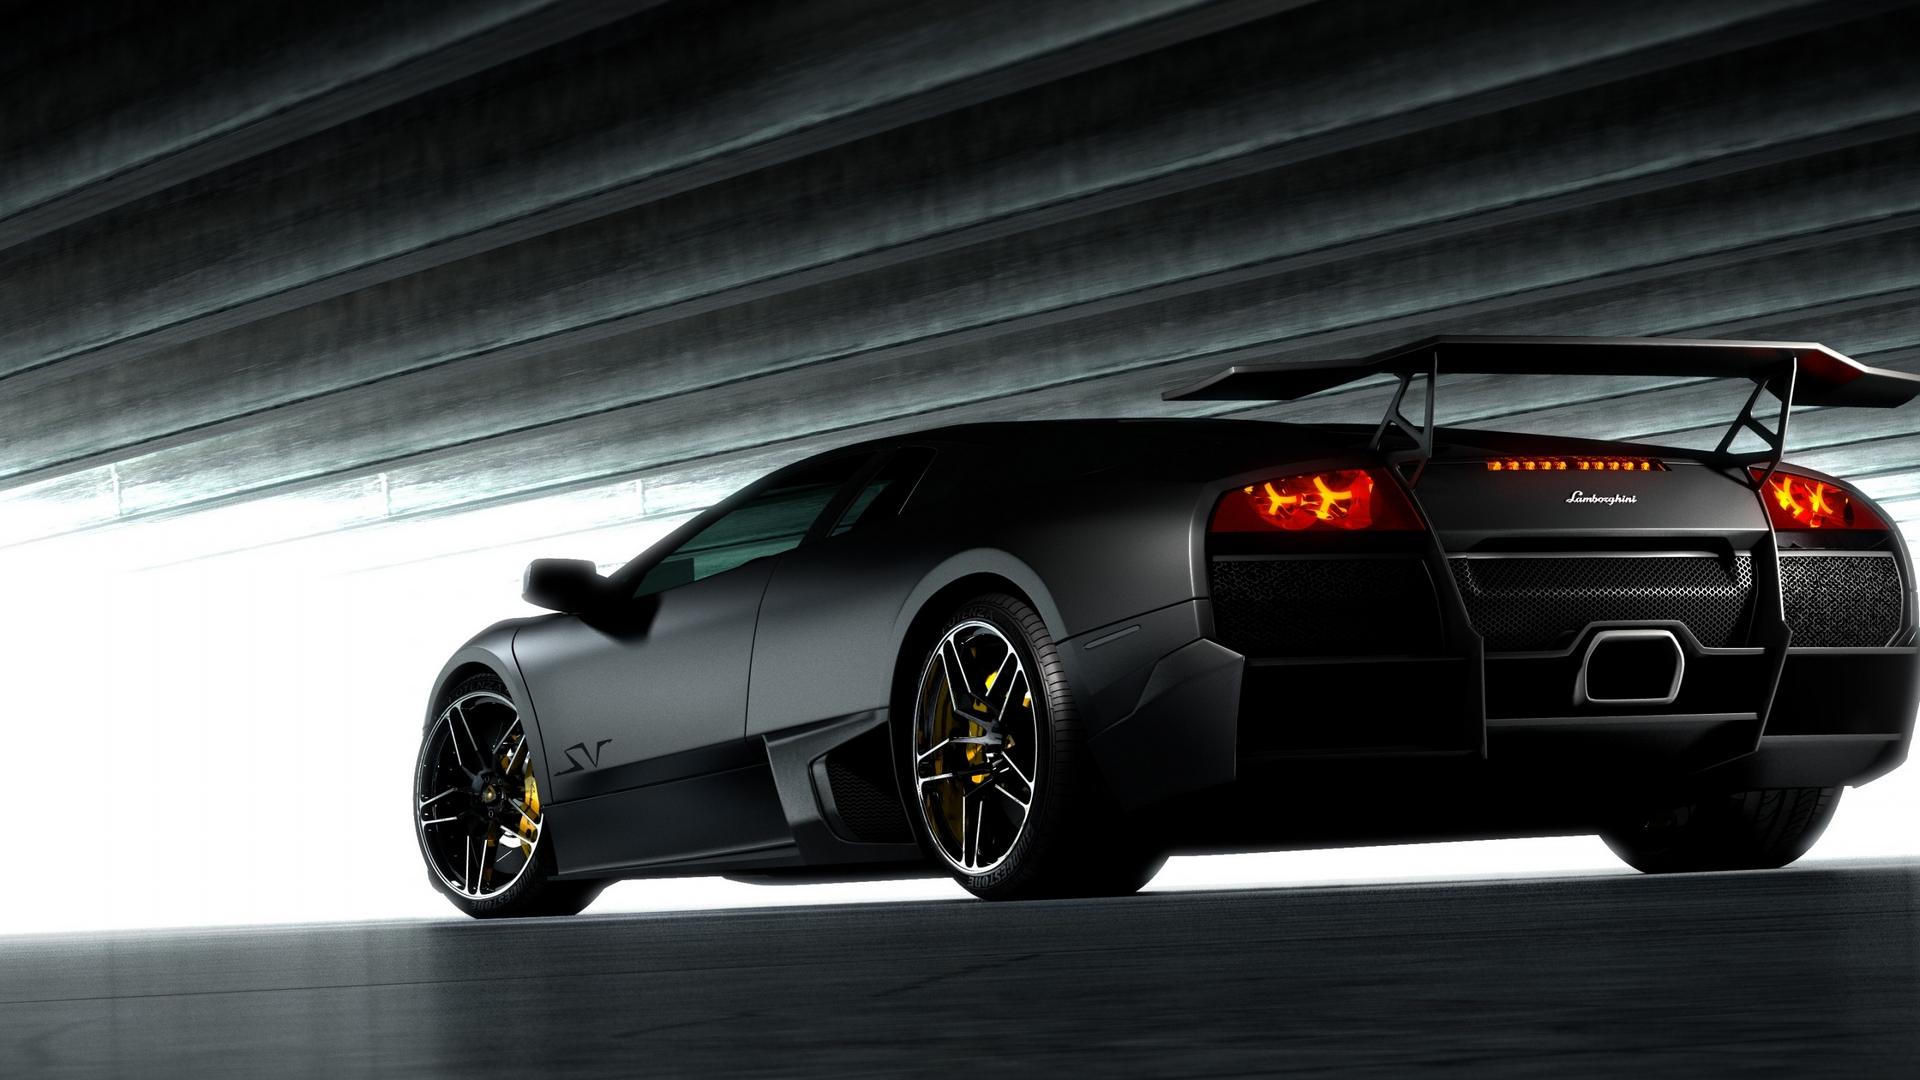 1920x1080px Lamborghini Murcielago Wallpaper Hd Wallpapersafari